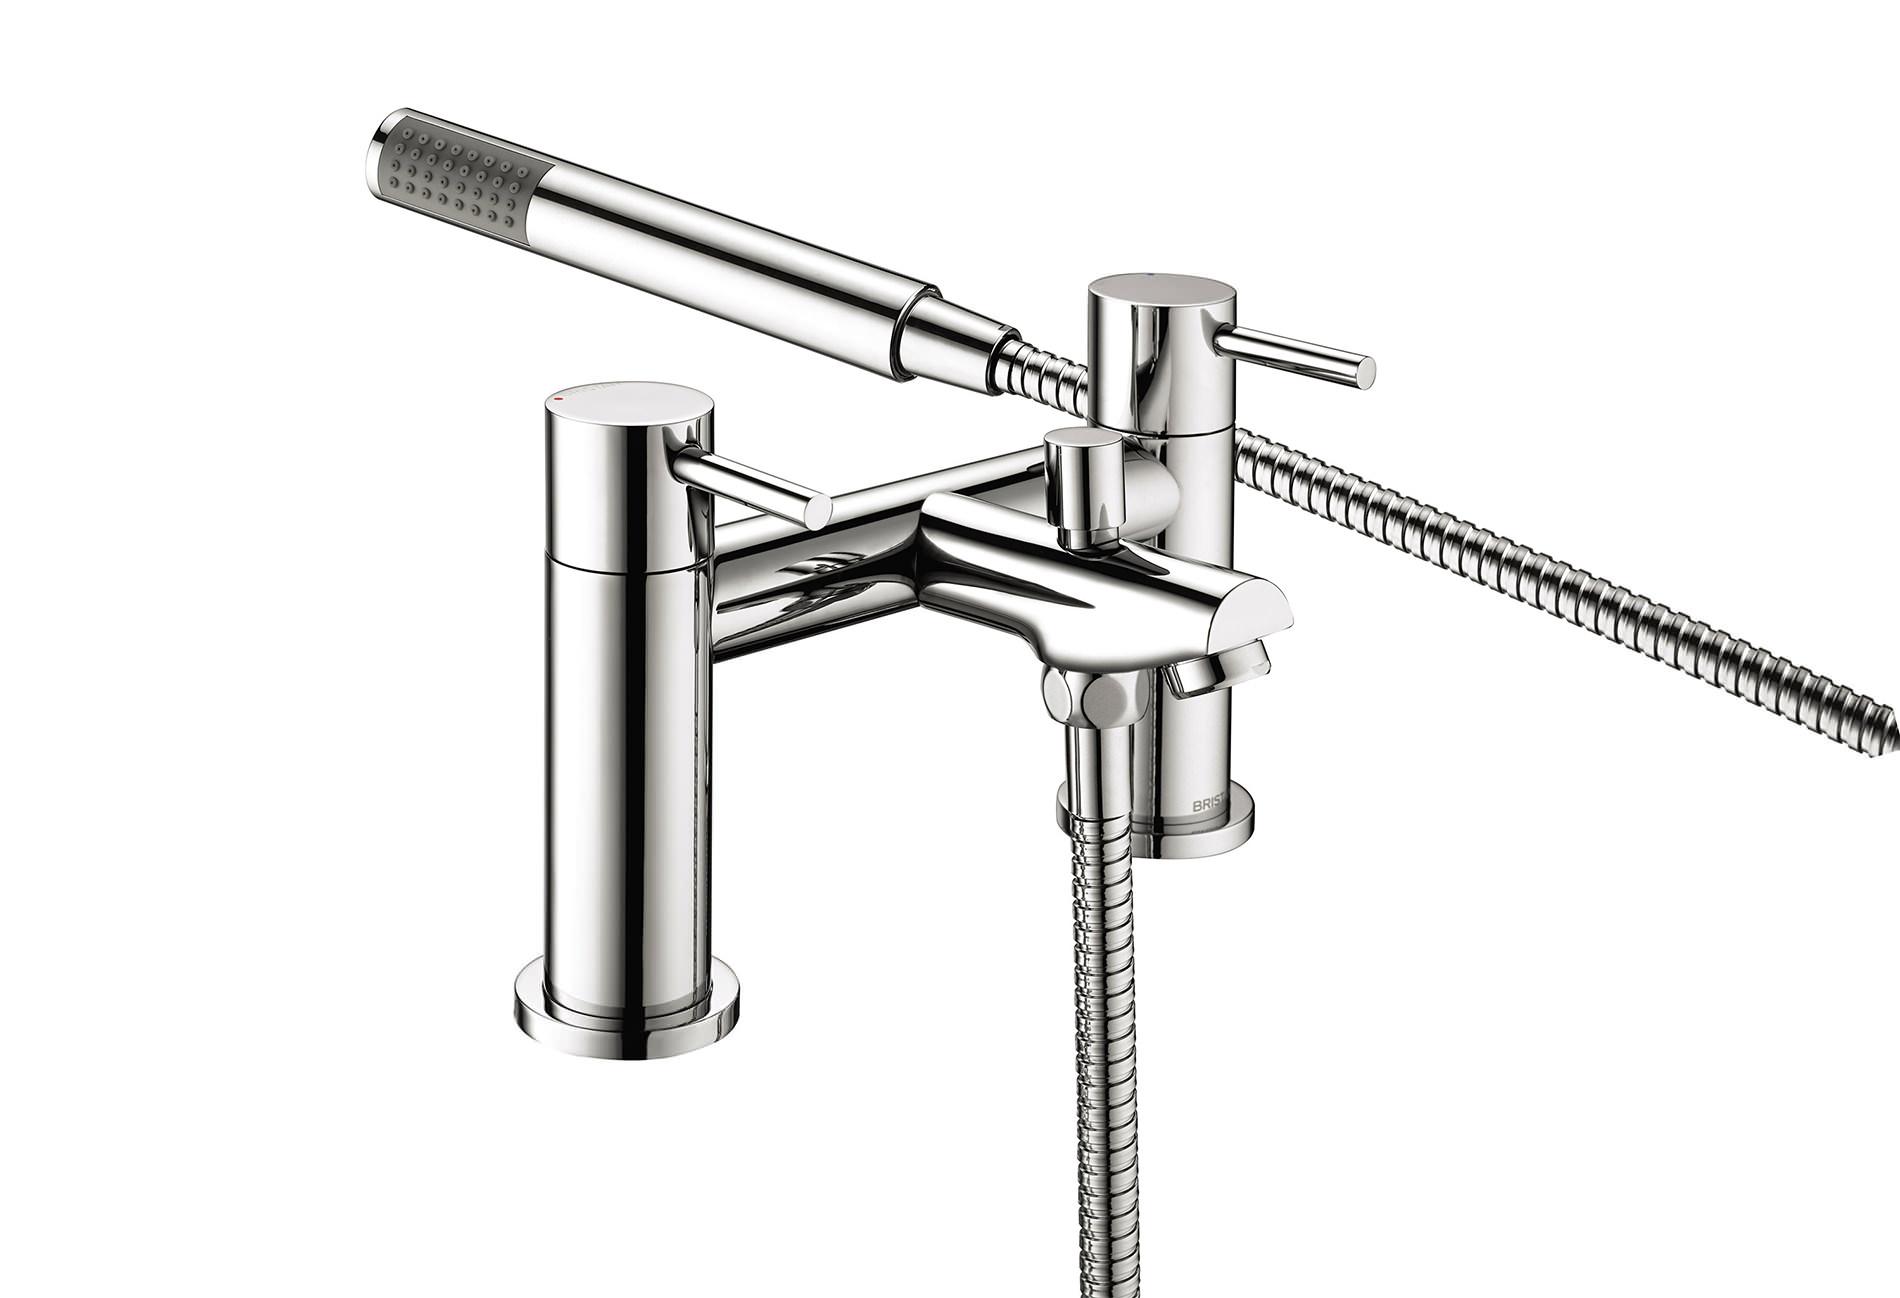 Chrome Bristan Kitchen Taps: Bristan Blitz Bath Shower Mixer Tap Chrome